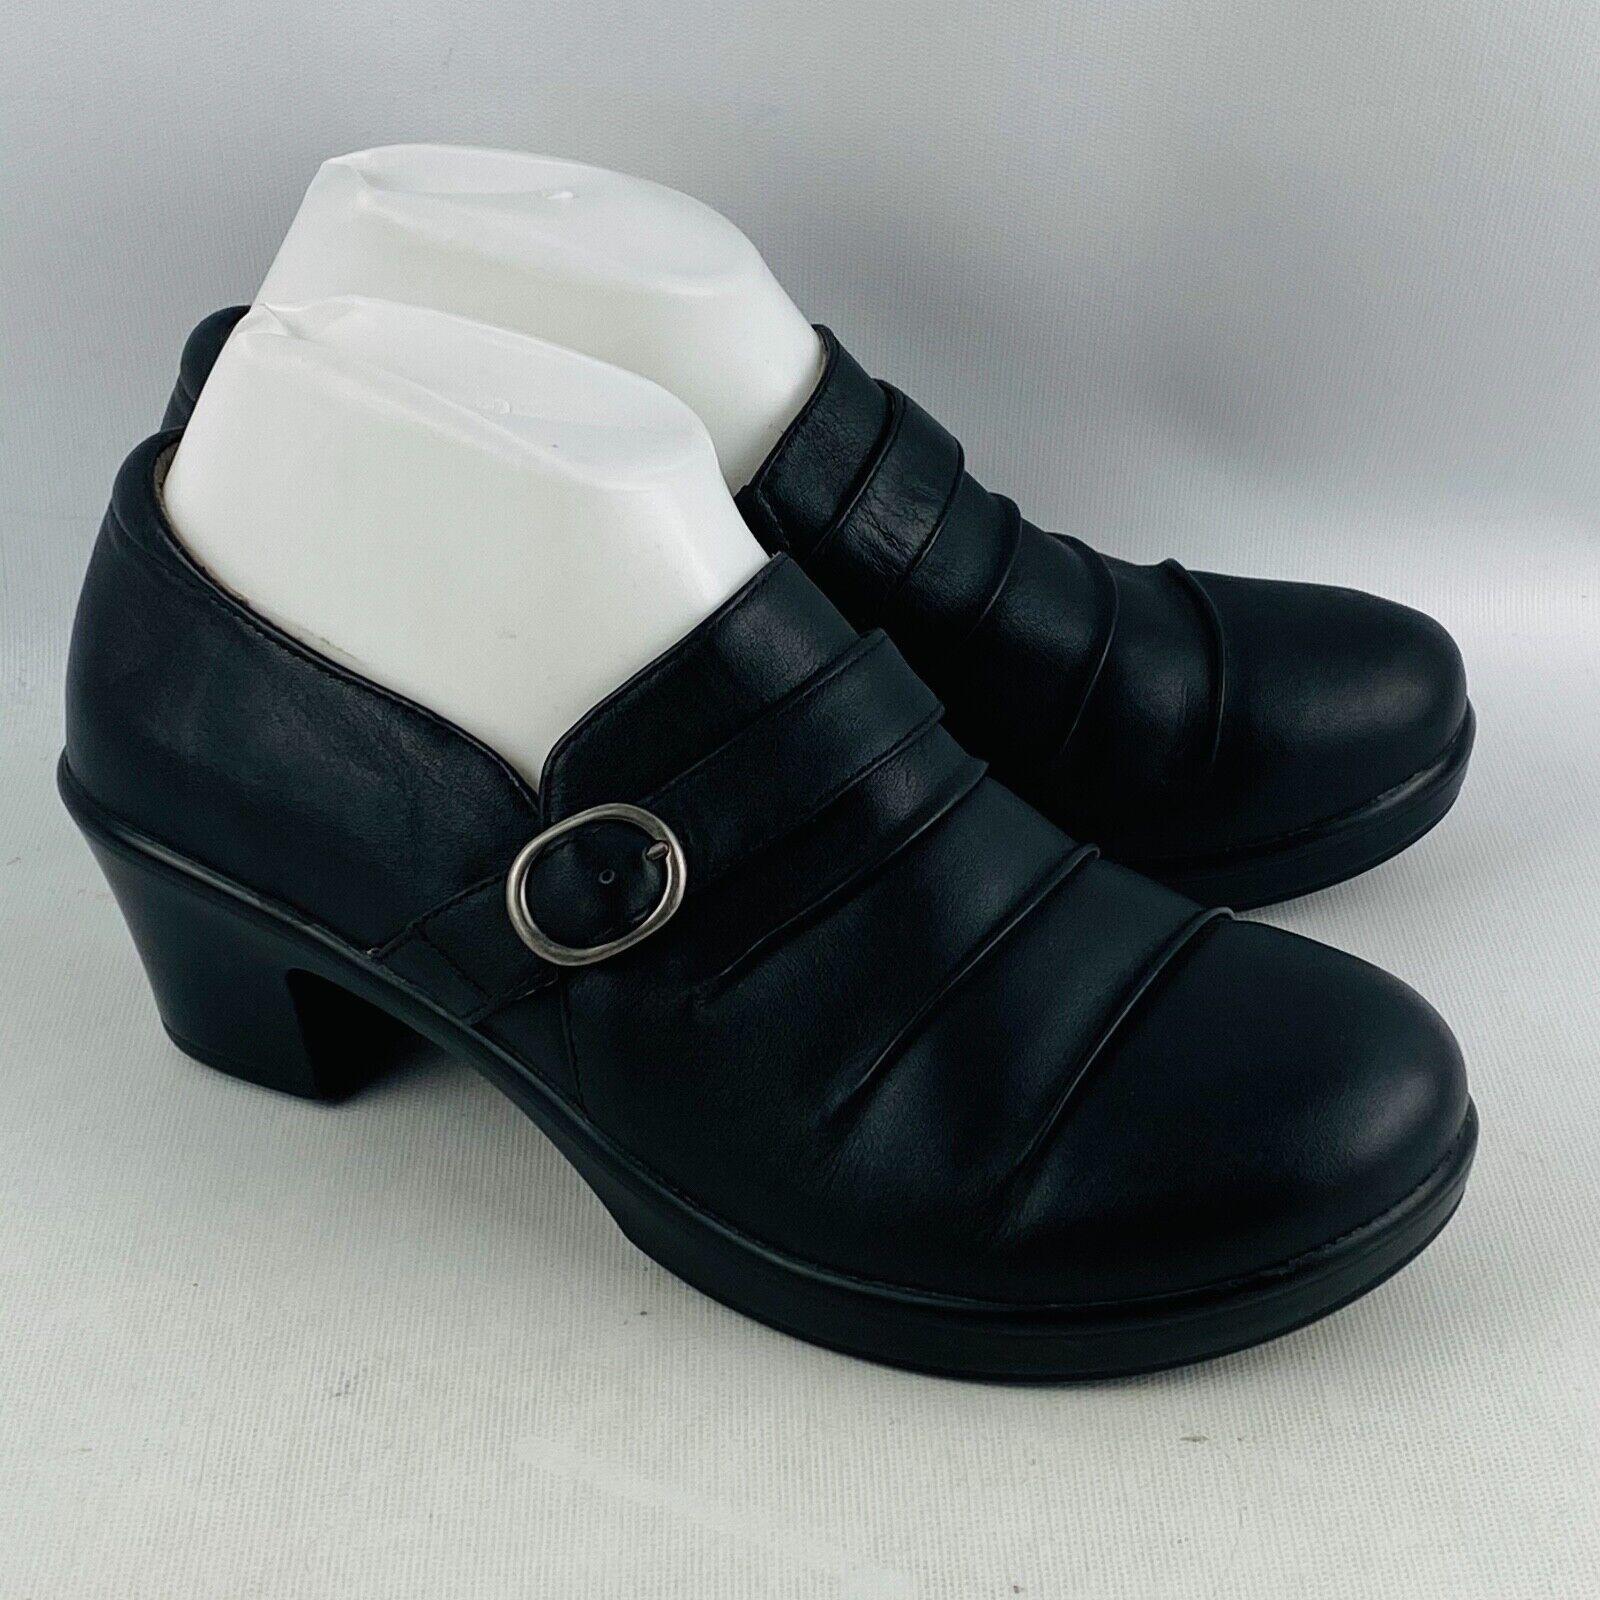 Womens EU 39 US 9-9.5 Alegria Halli Black Nappa Dress Leather Slip On Shoes